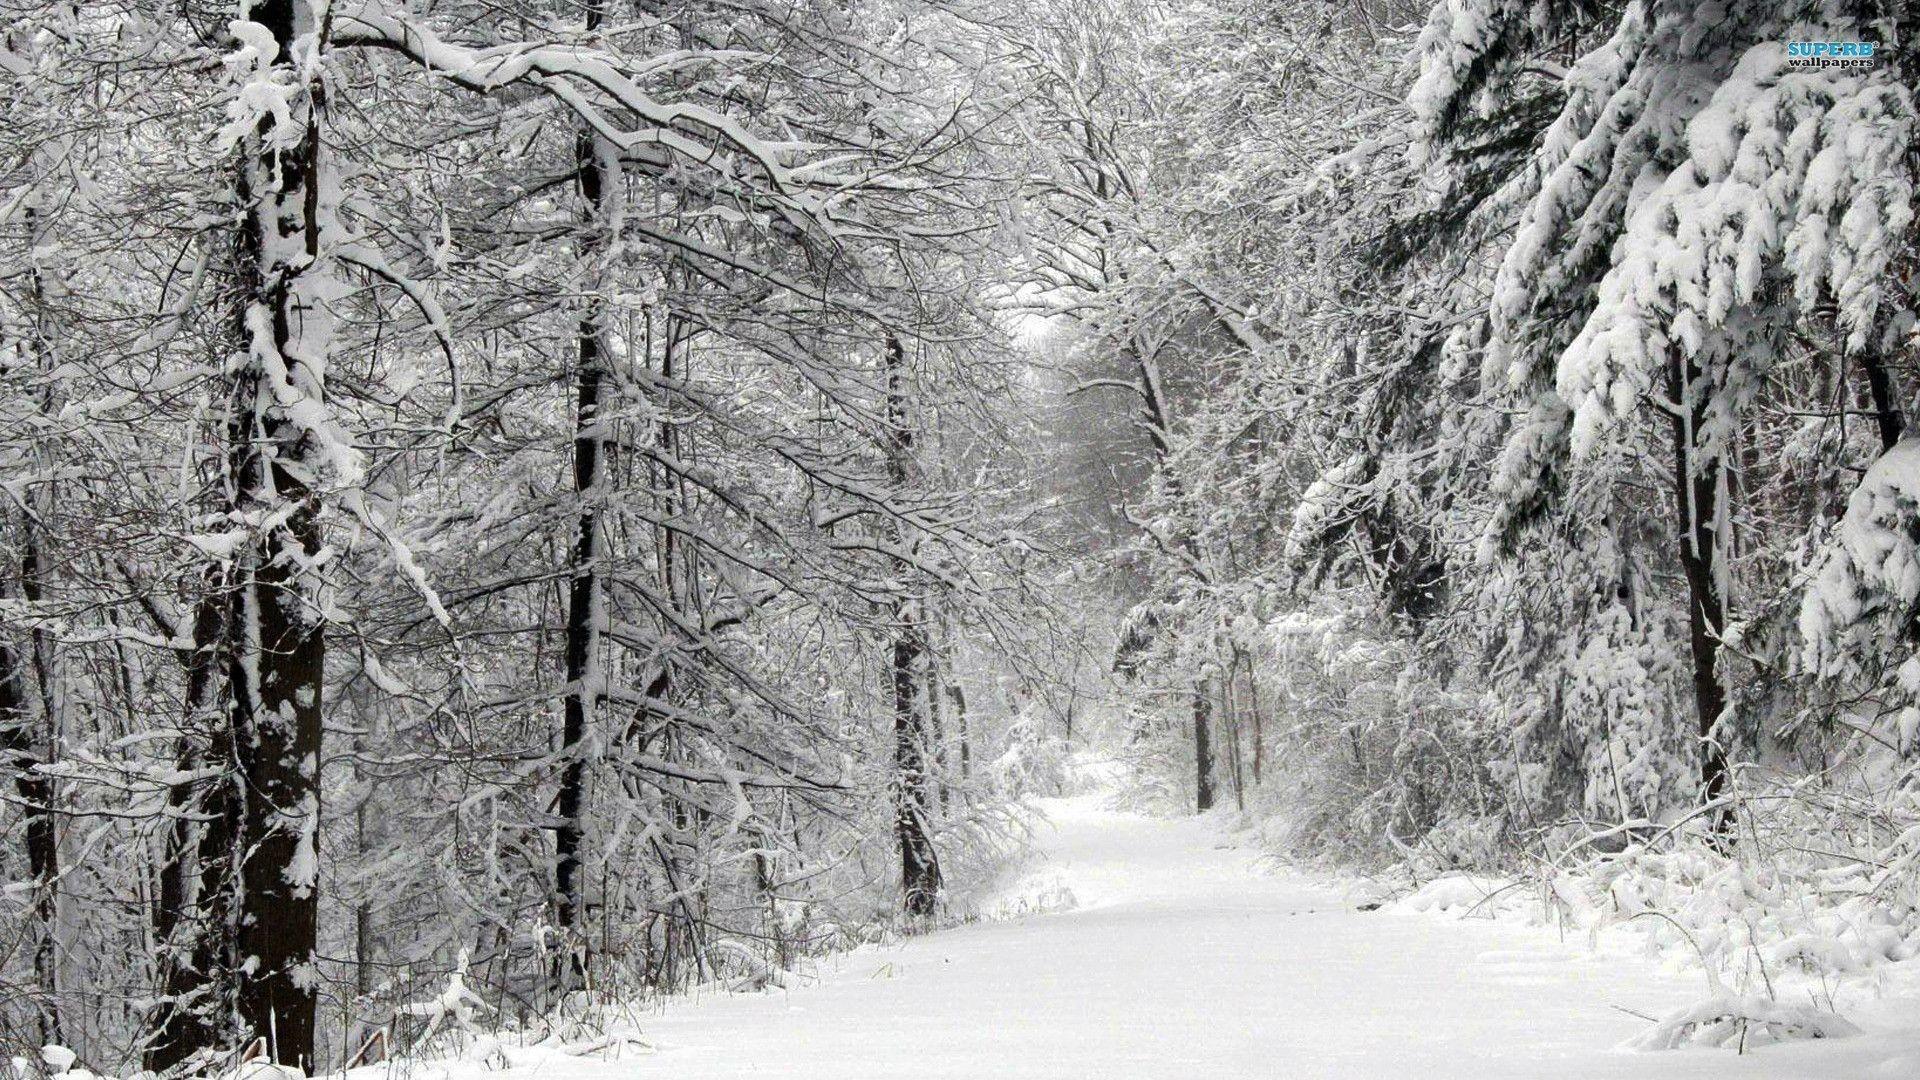 Winter Forest Black White Стоковые Фотографии 369671378 ... |Winter Forest Black And White